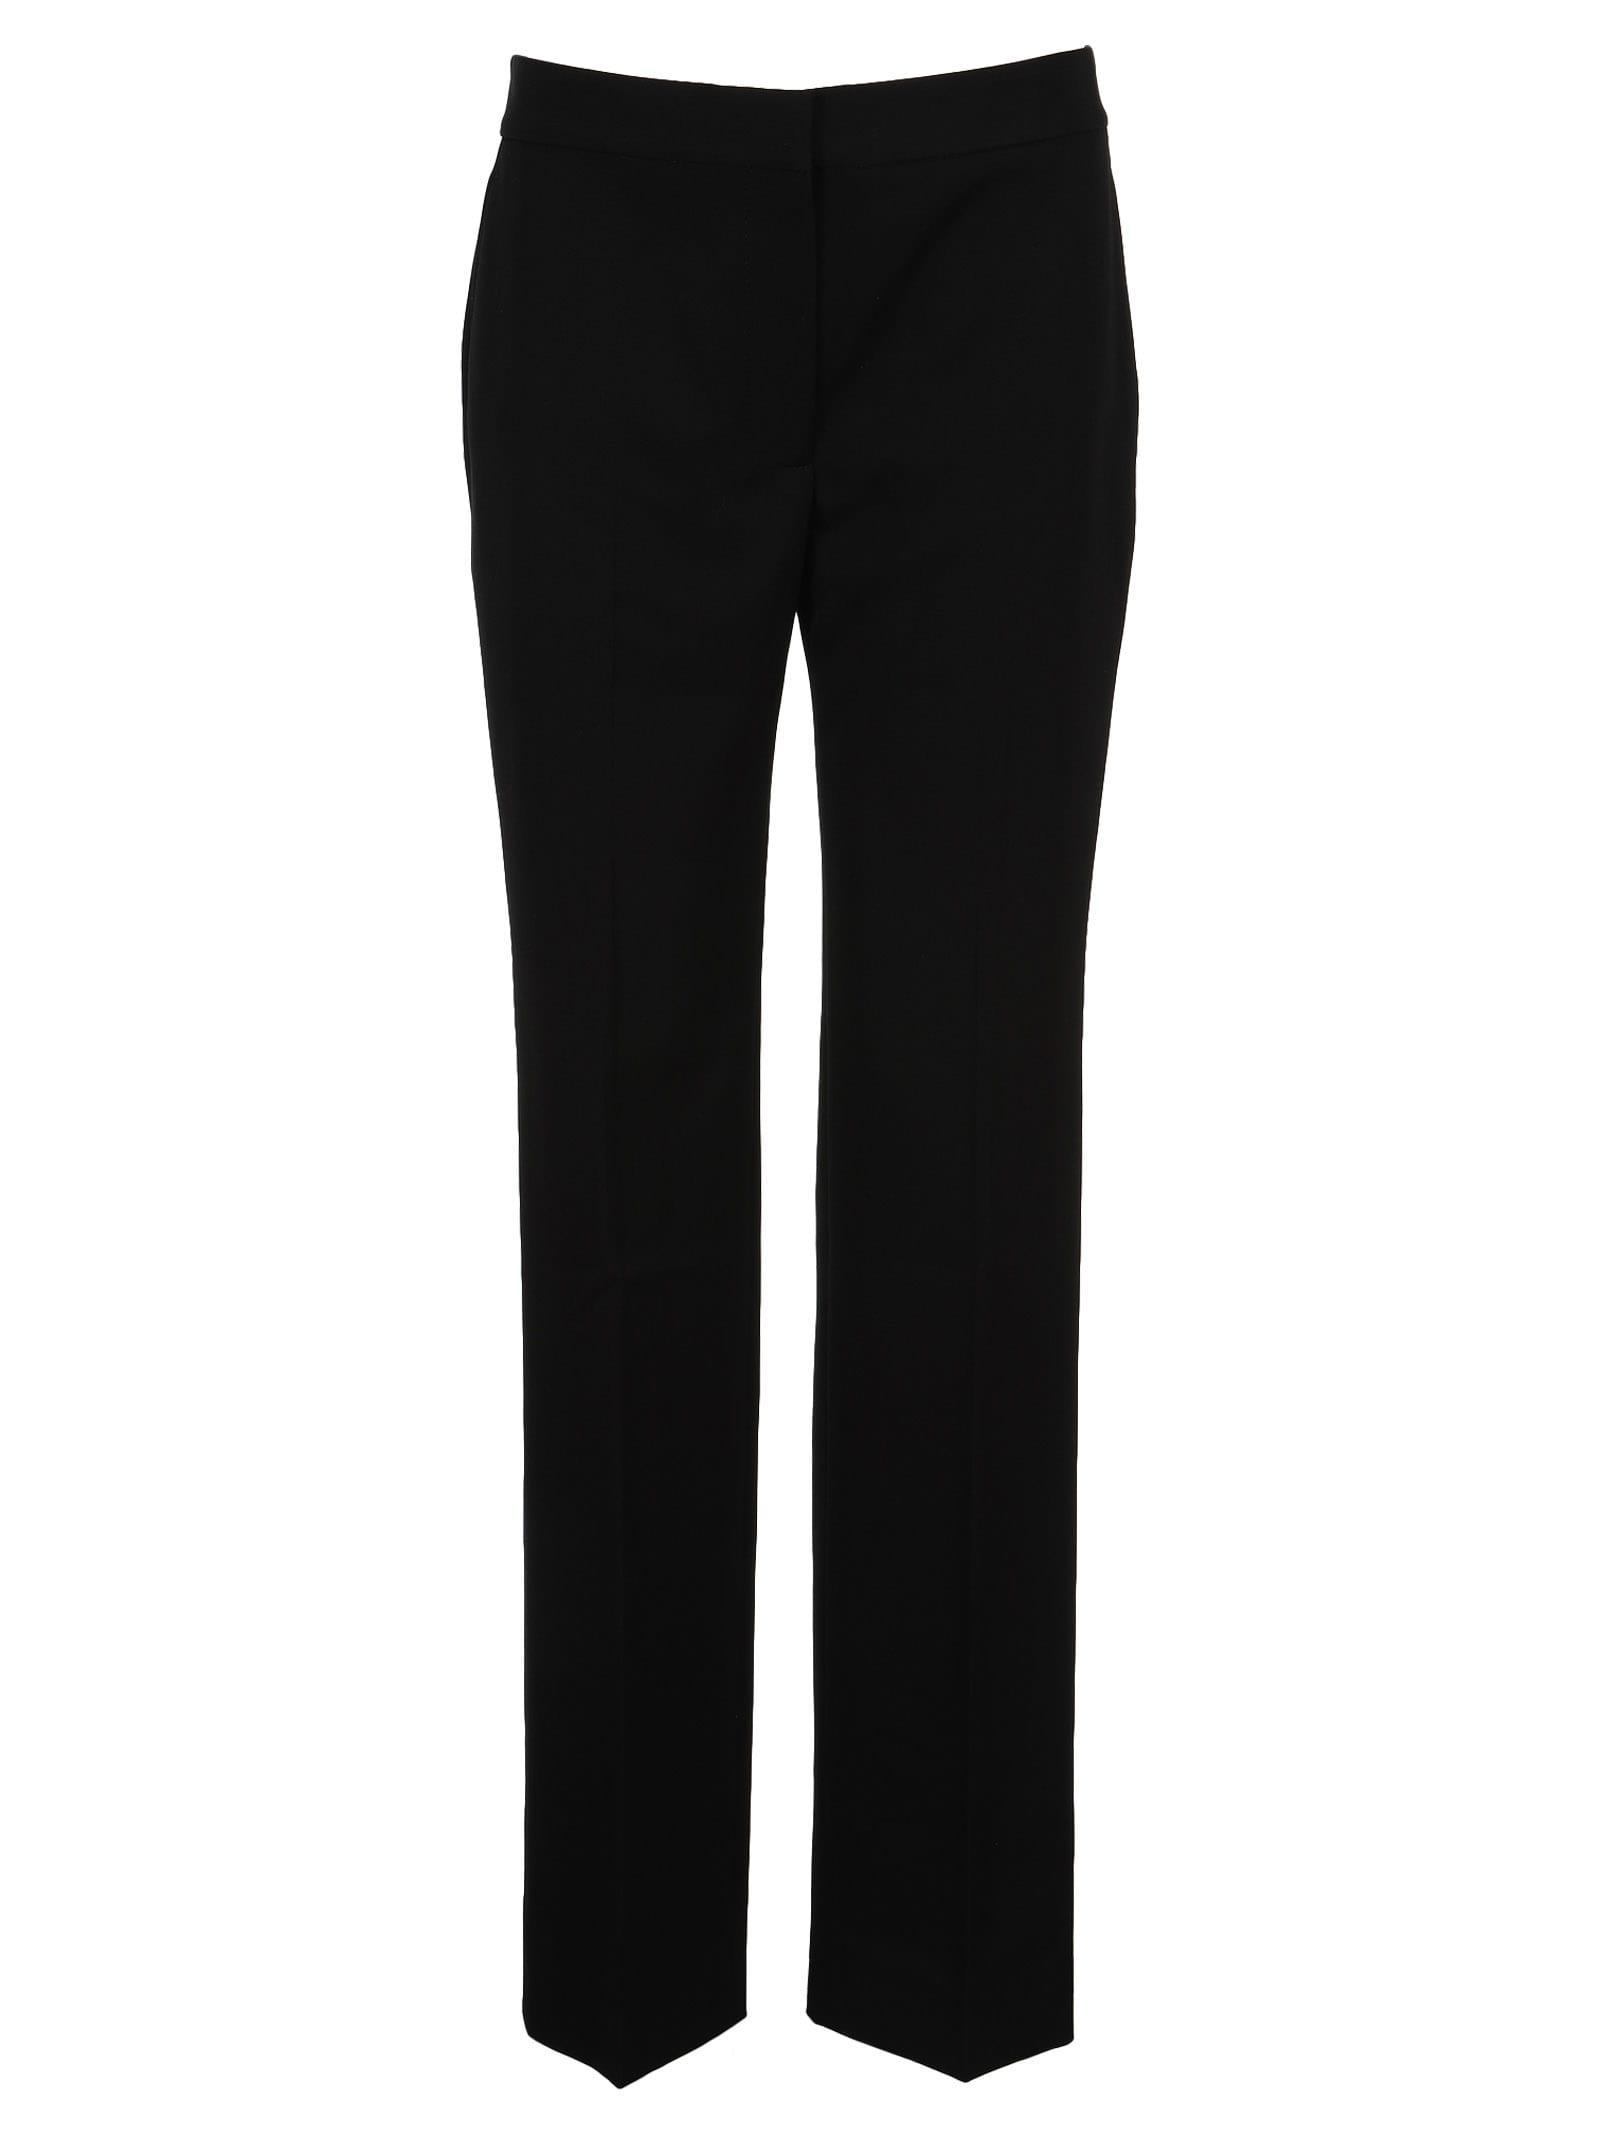 Stella Mccartney High Waist Trousers